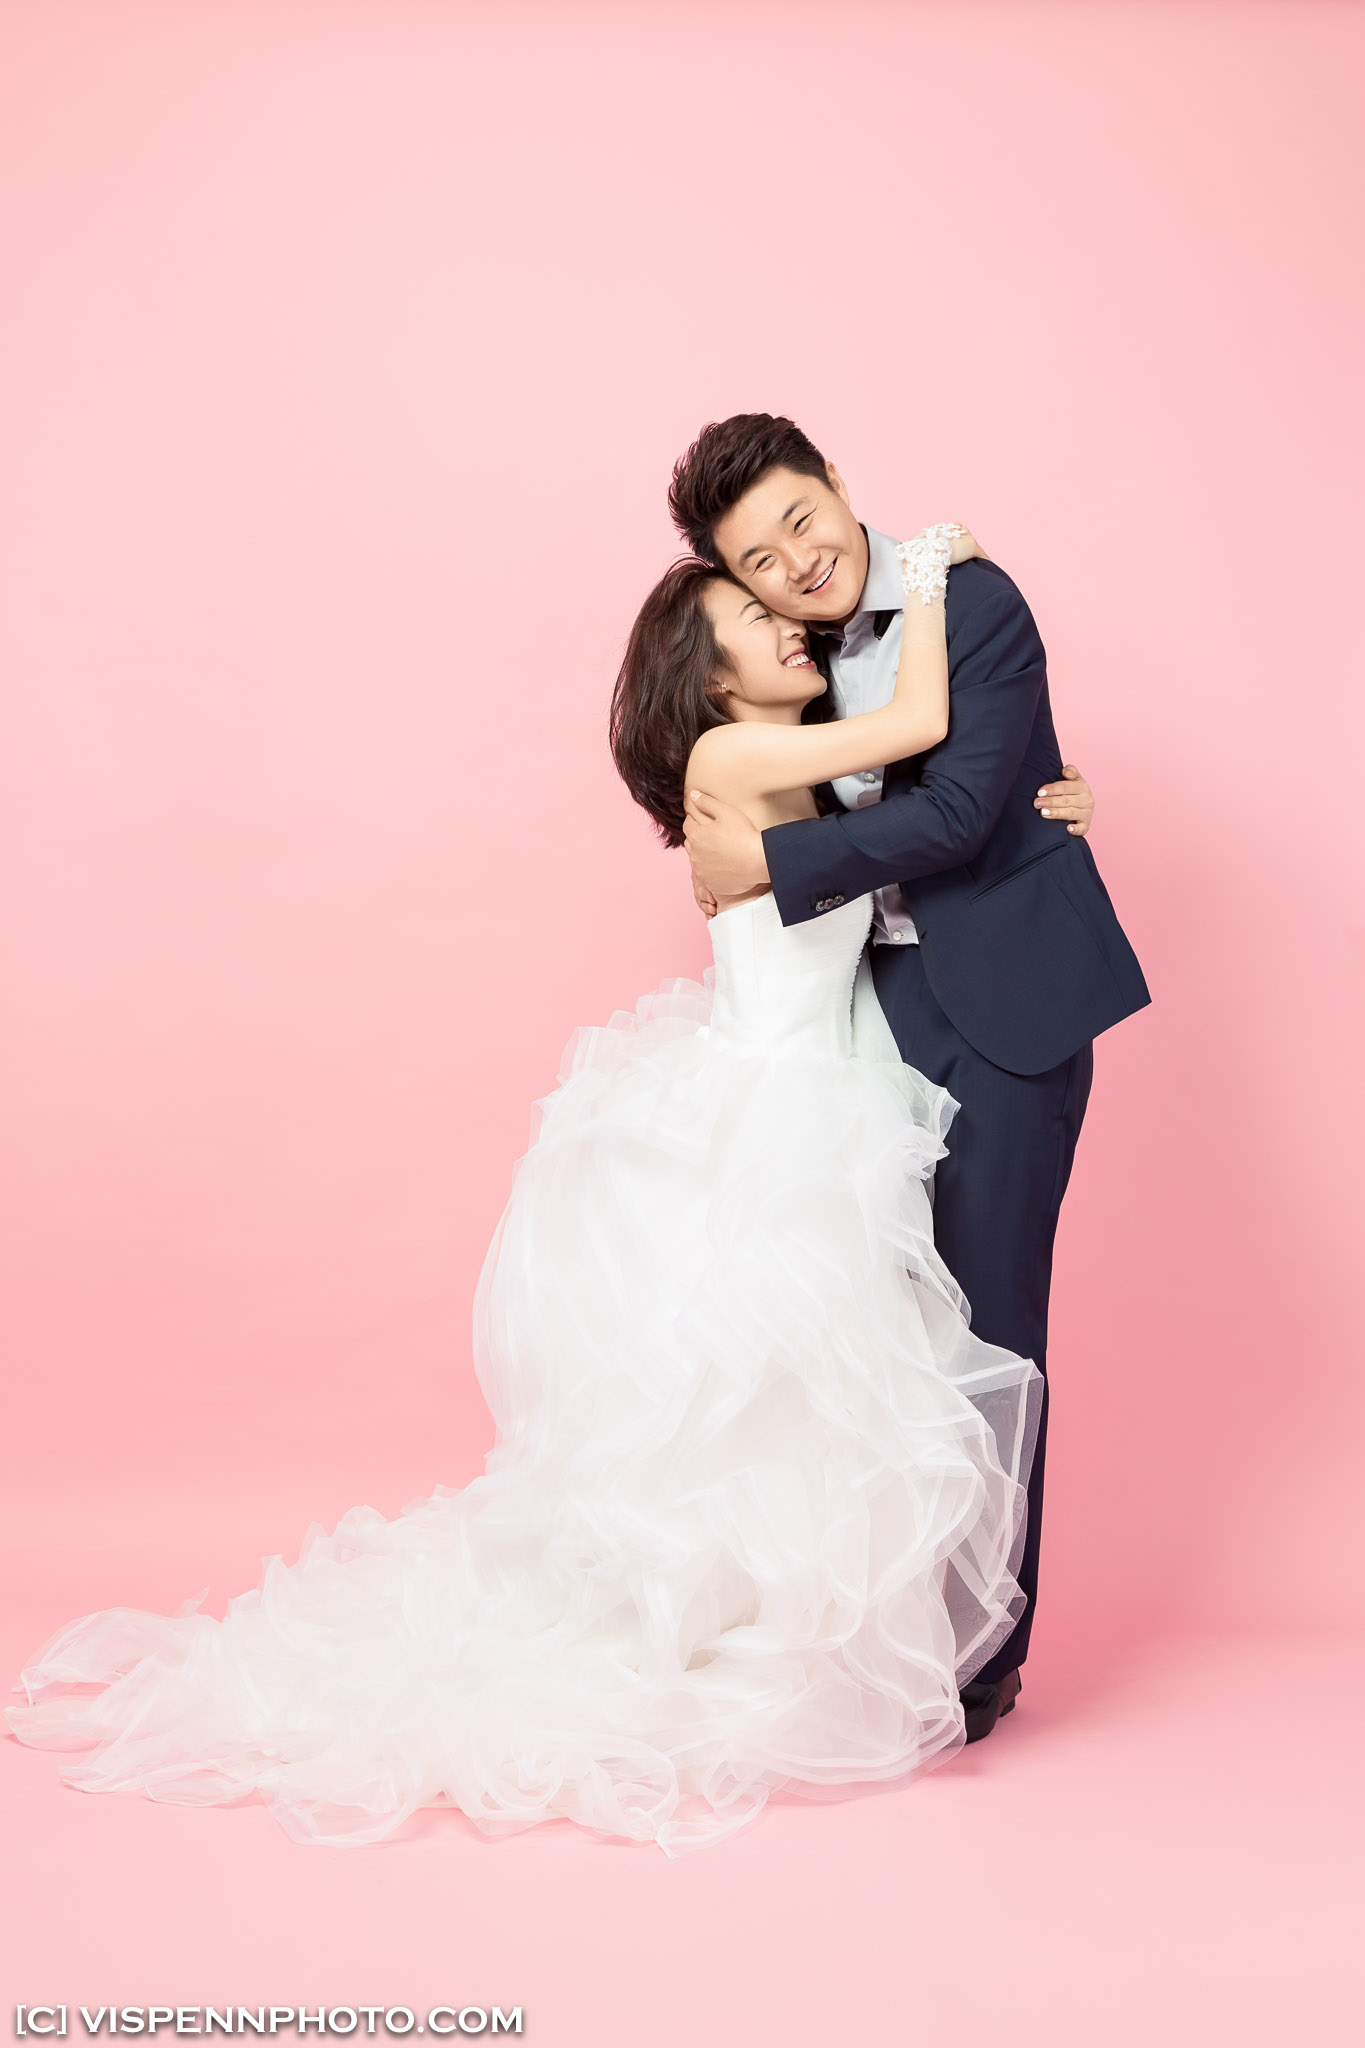 PRE WEDDING Photography Melbourne VISPENN 墨尔本 婚纱照 结婚照 婚纱摄影 5D1 1823